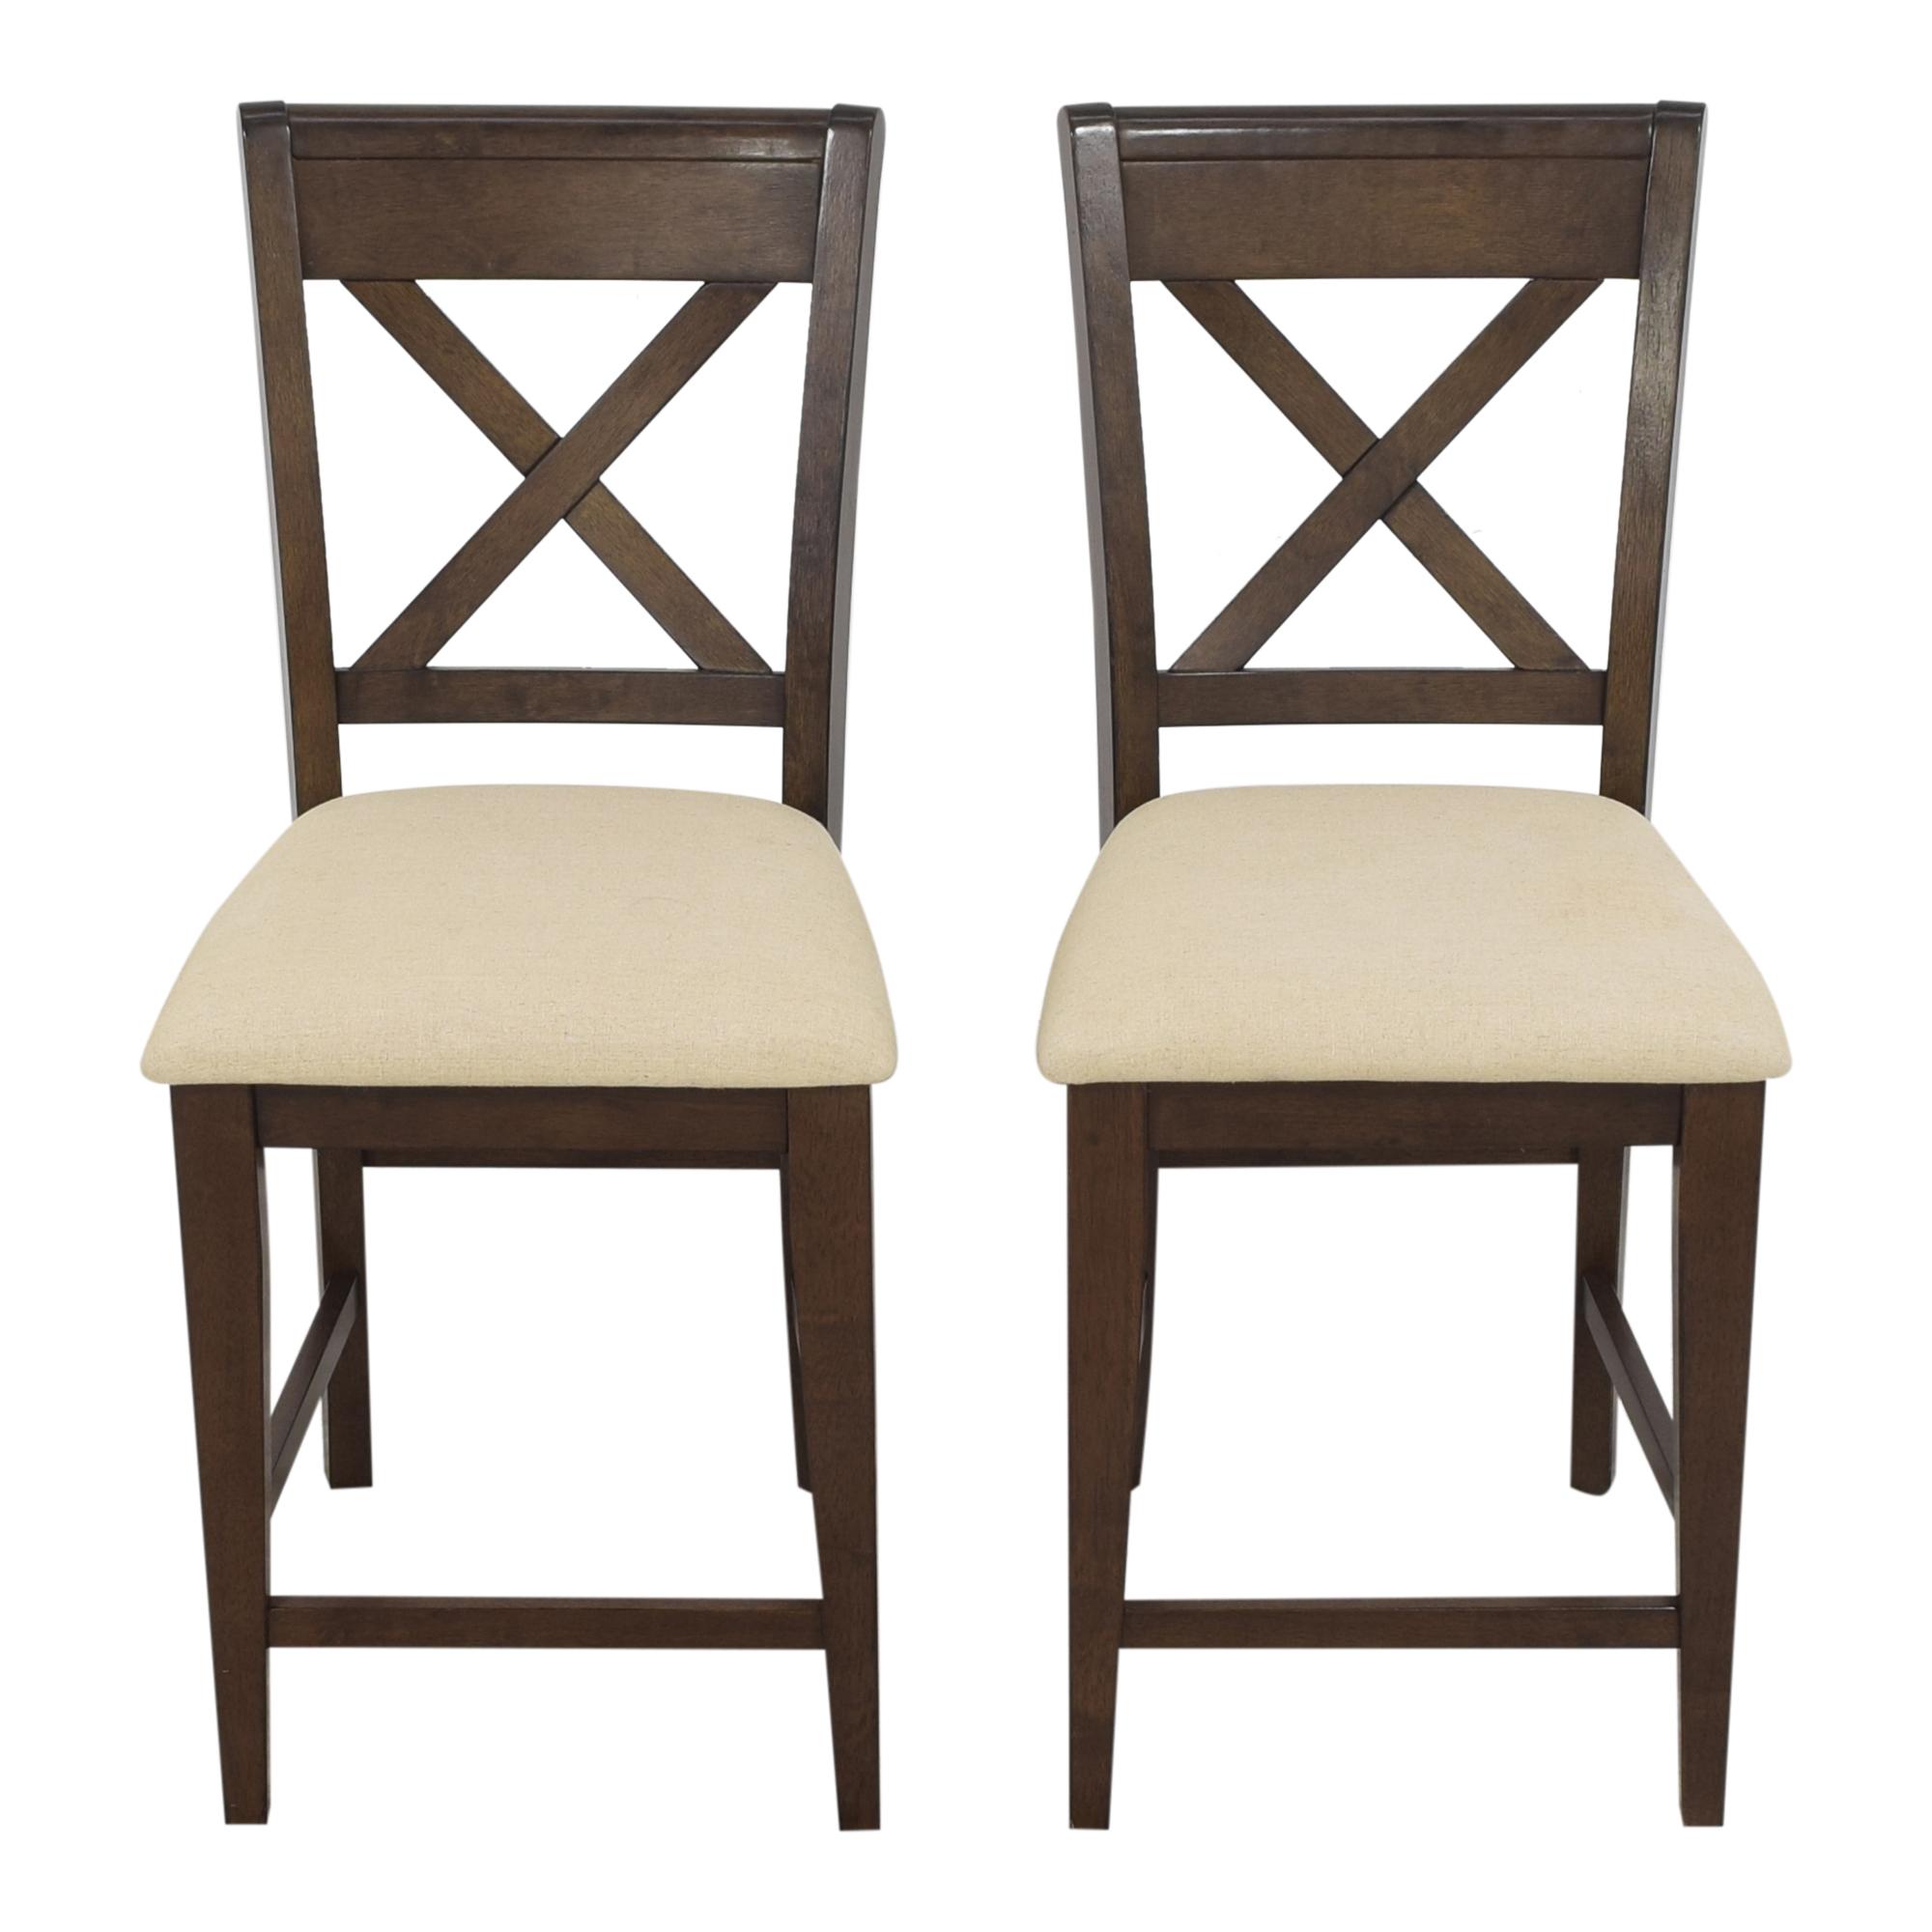 Raymour & Flanigan Upholstered Stools / Stools